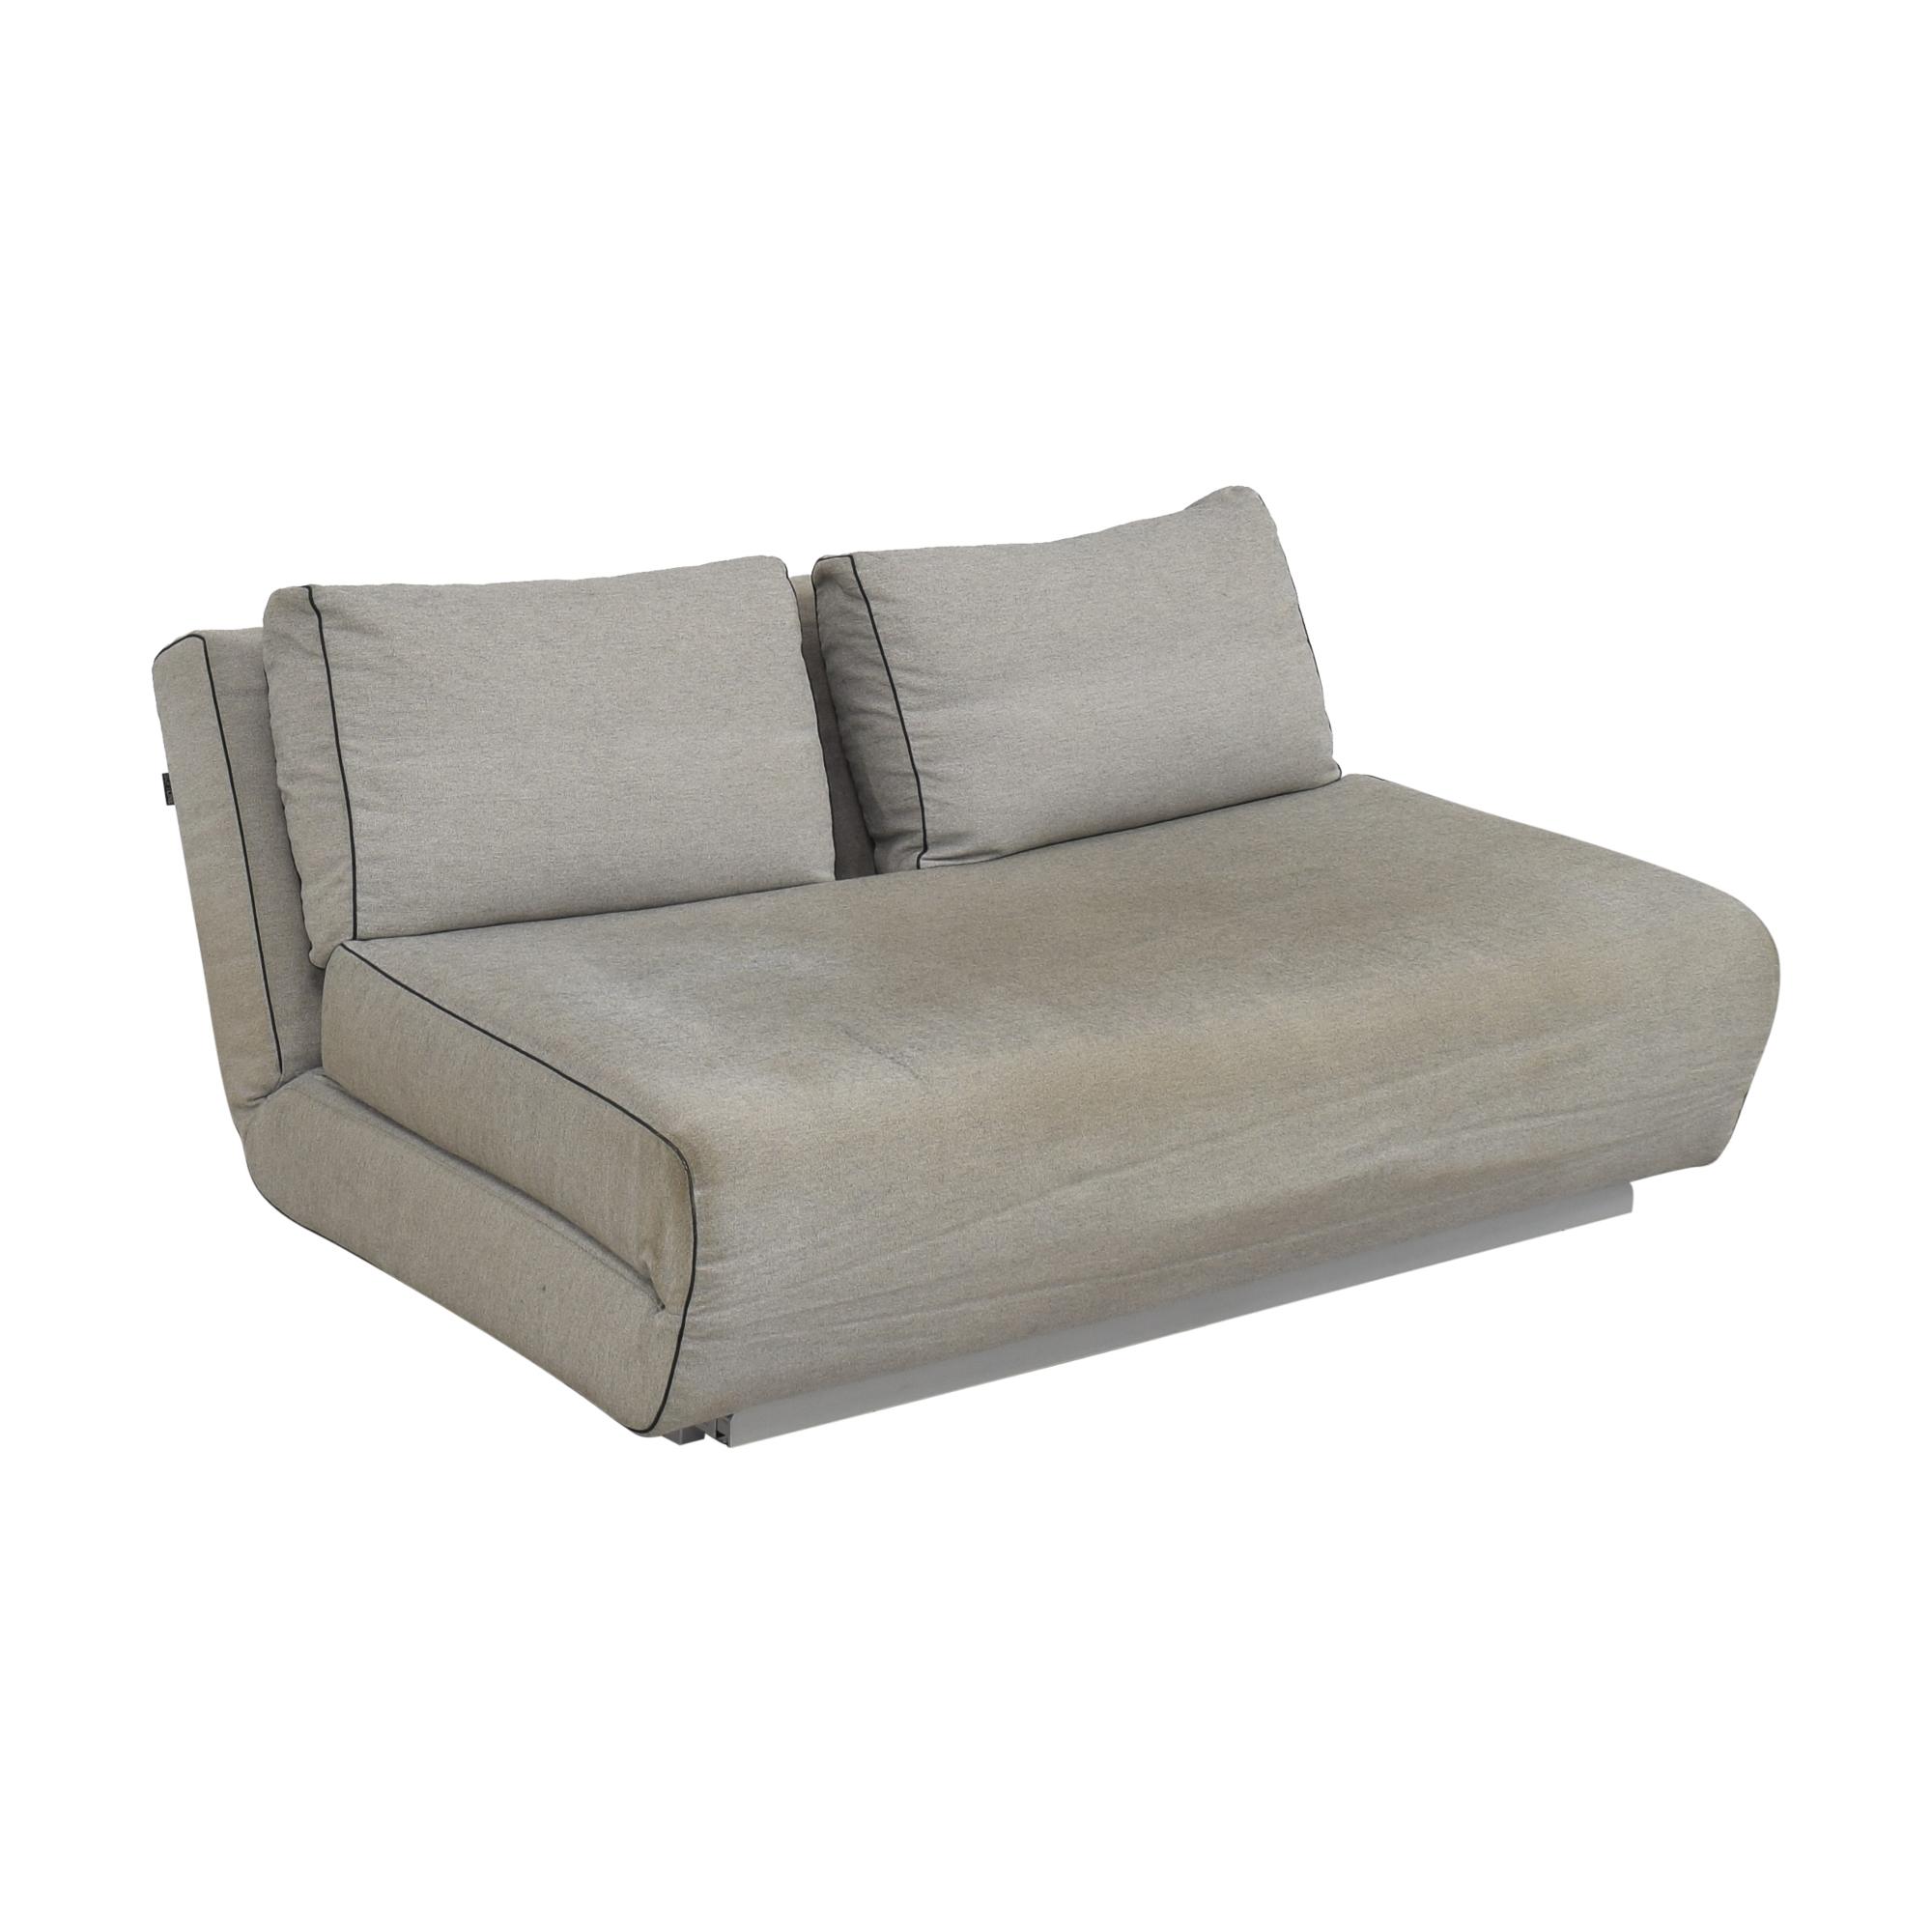 Softline Softline City 2.5 Seater Sofa Bed second hand